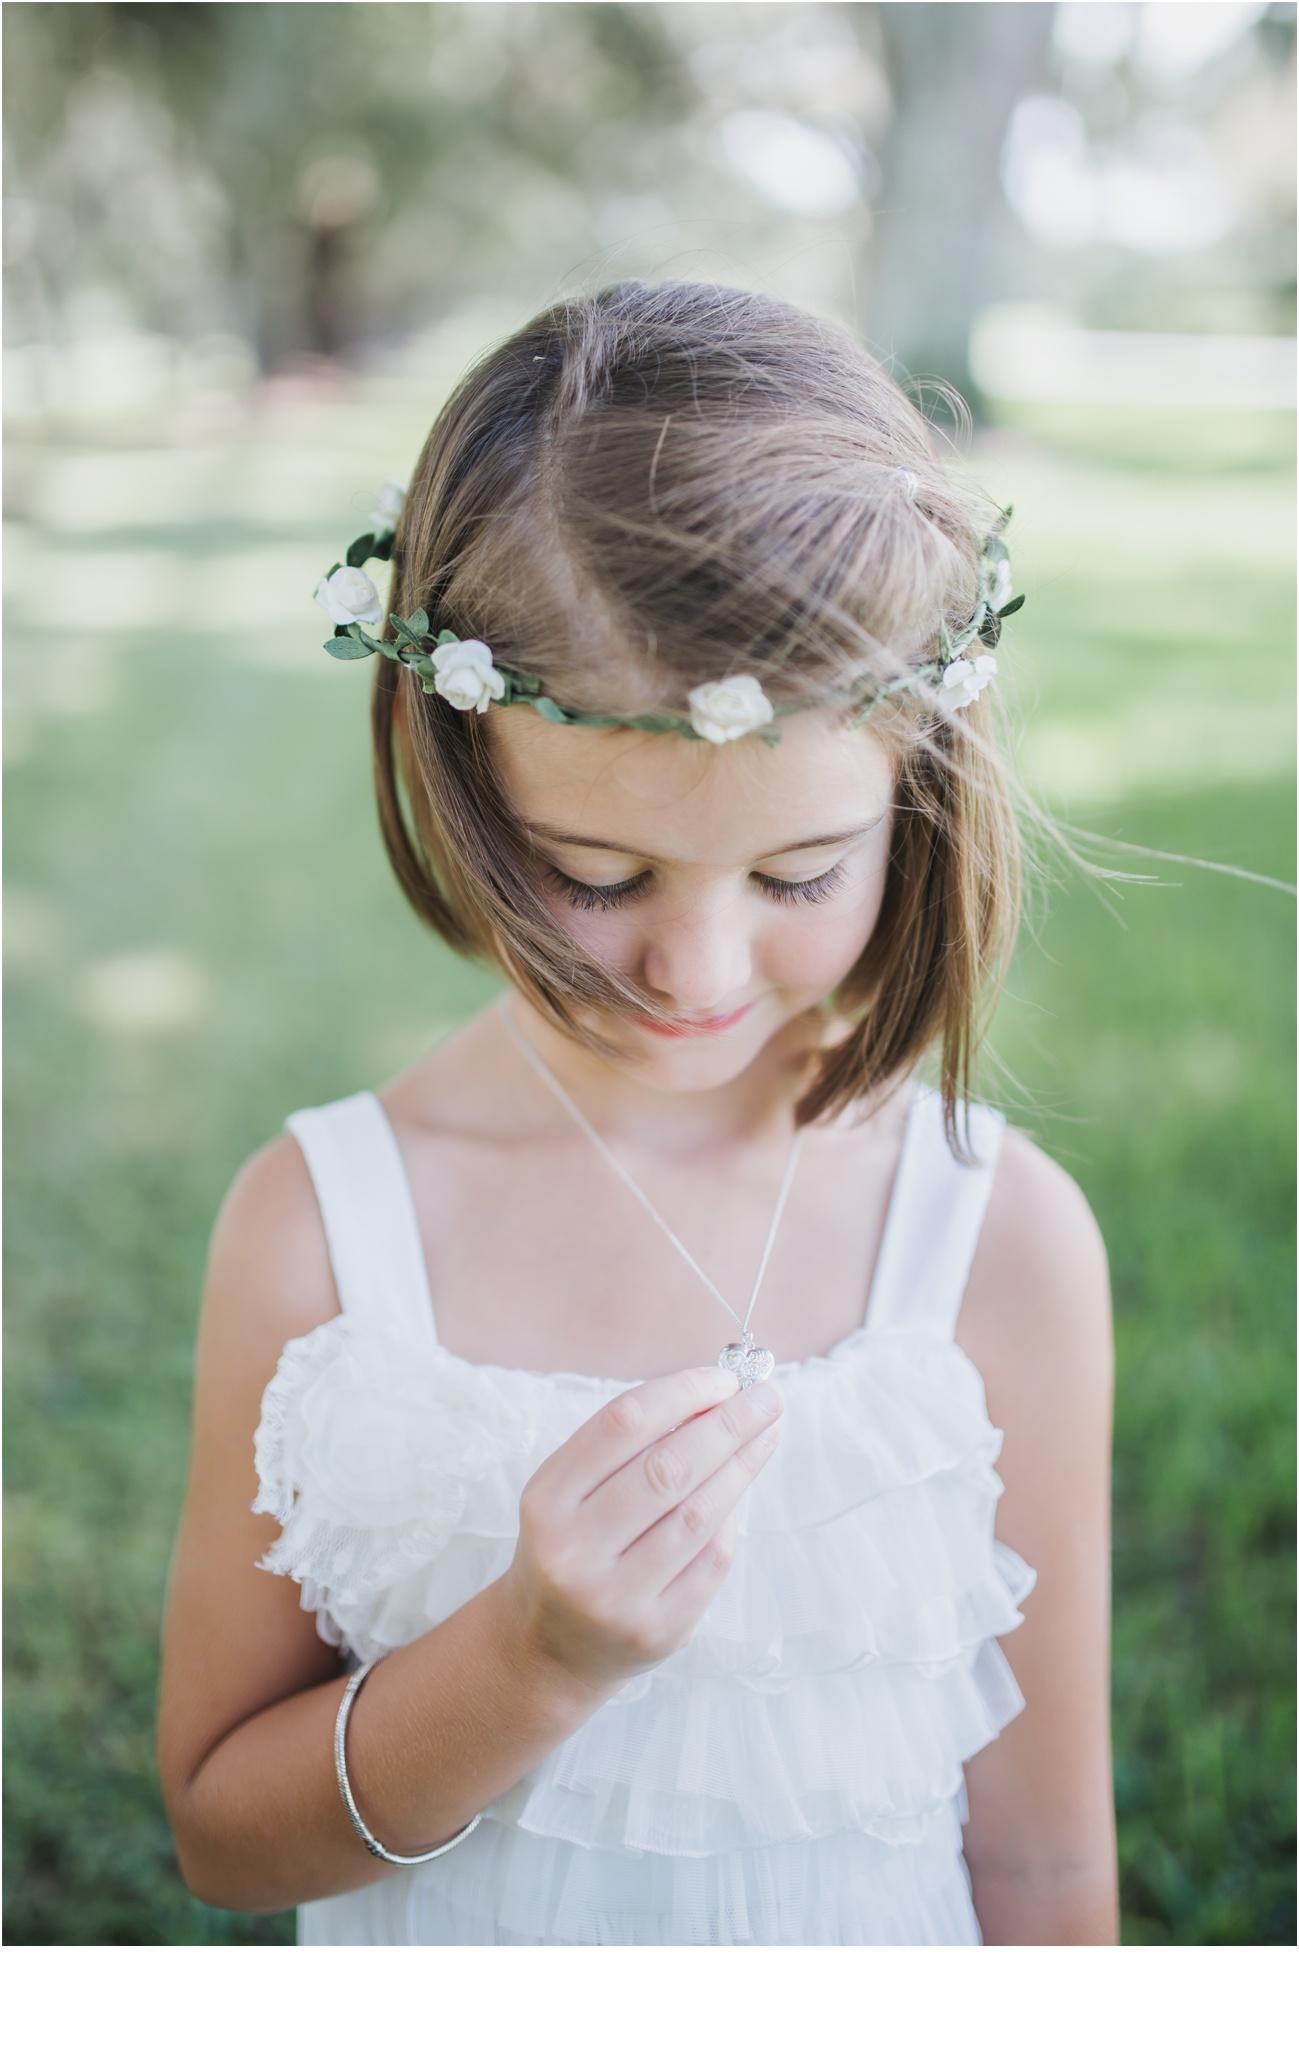 Rainey_Gregg_Photography_St._Simons_Island_Georgia_California_Wedding_Portrait_Photography_1111.jpg